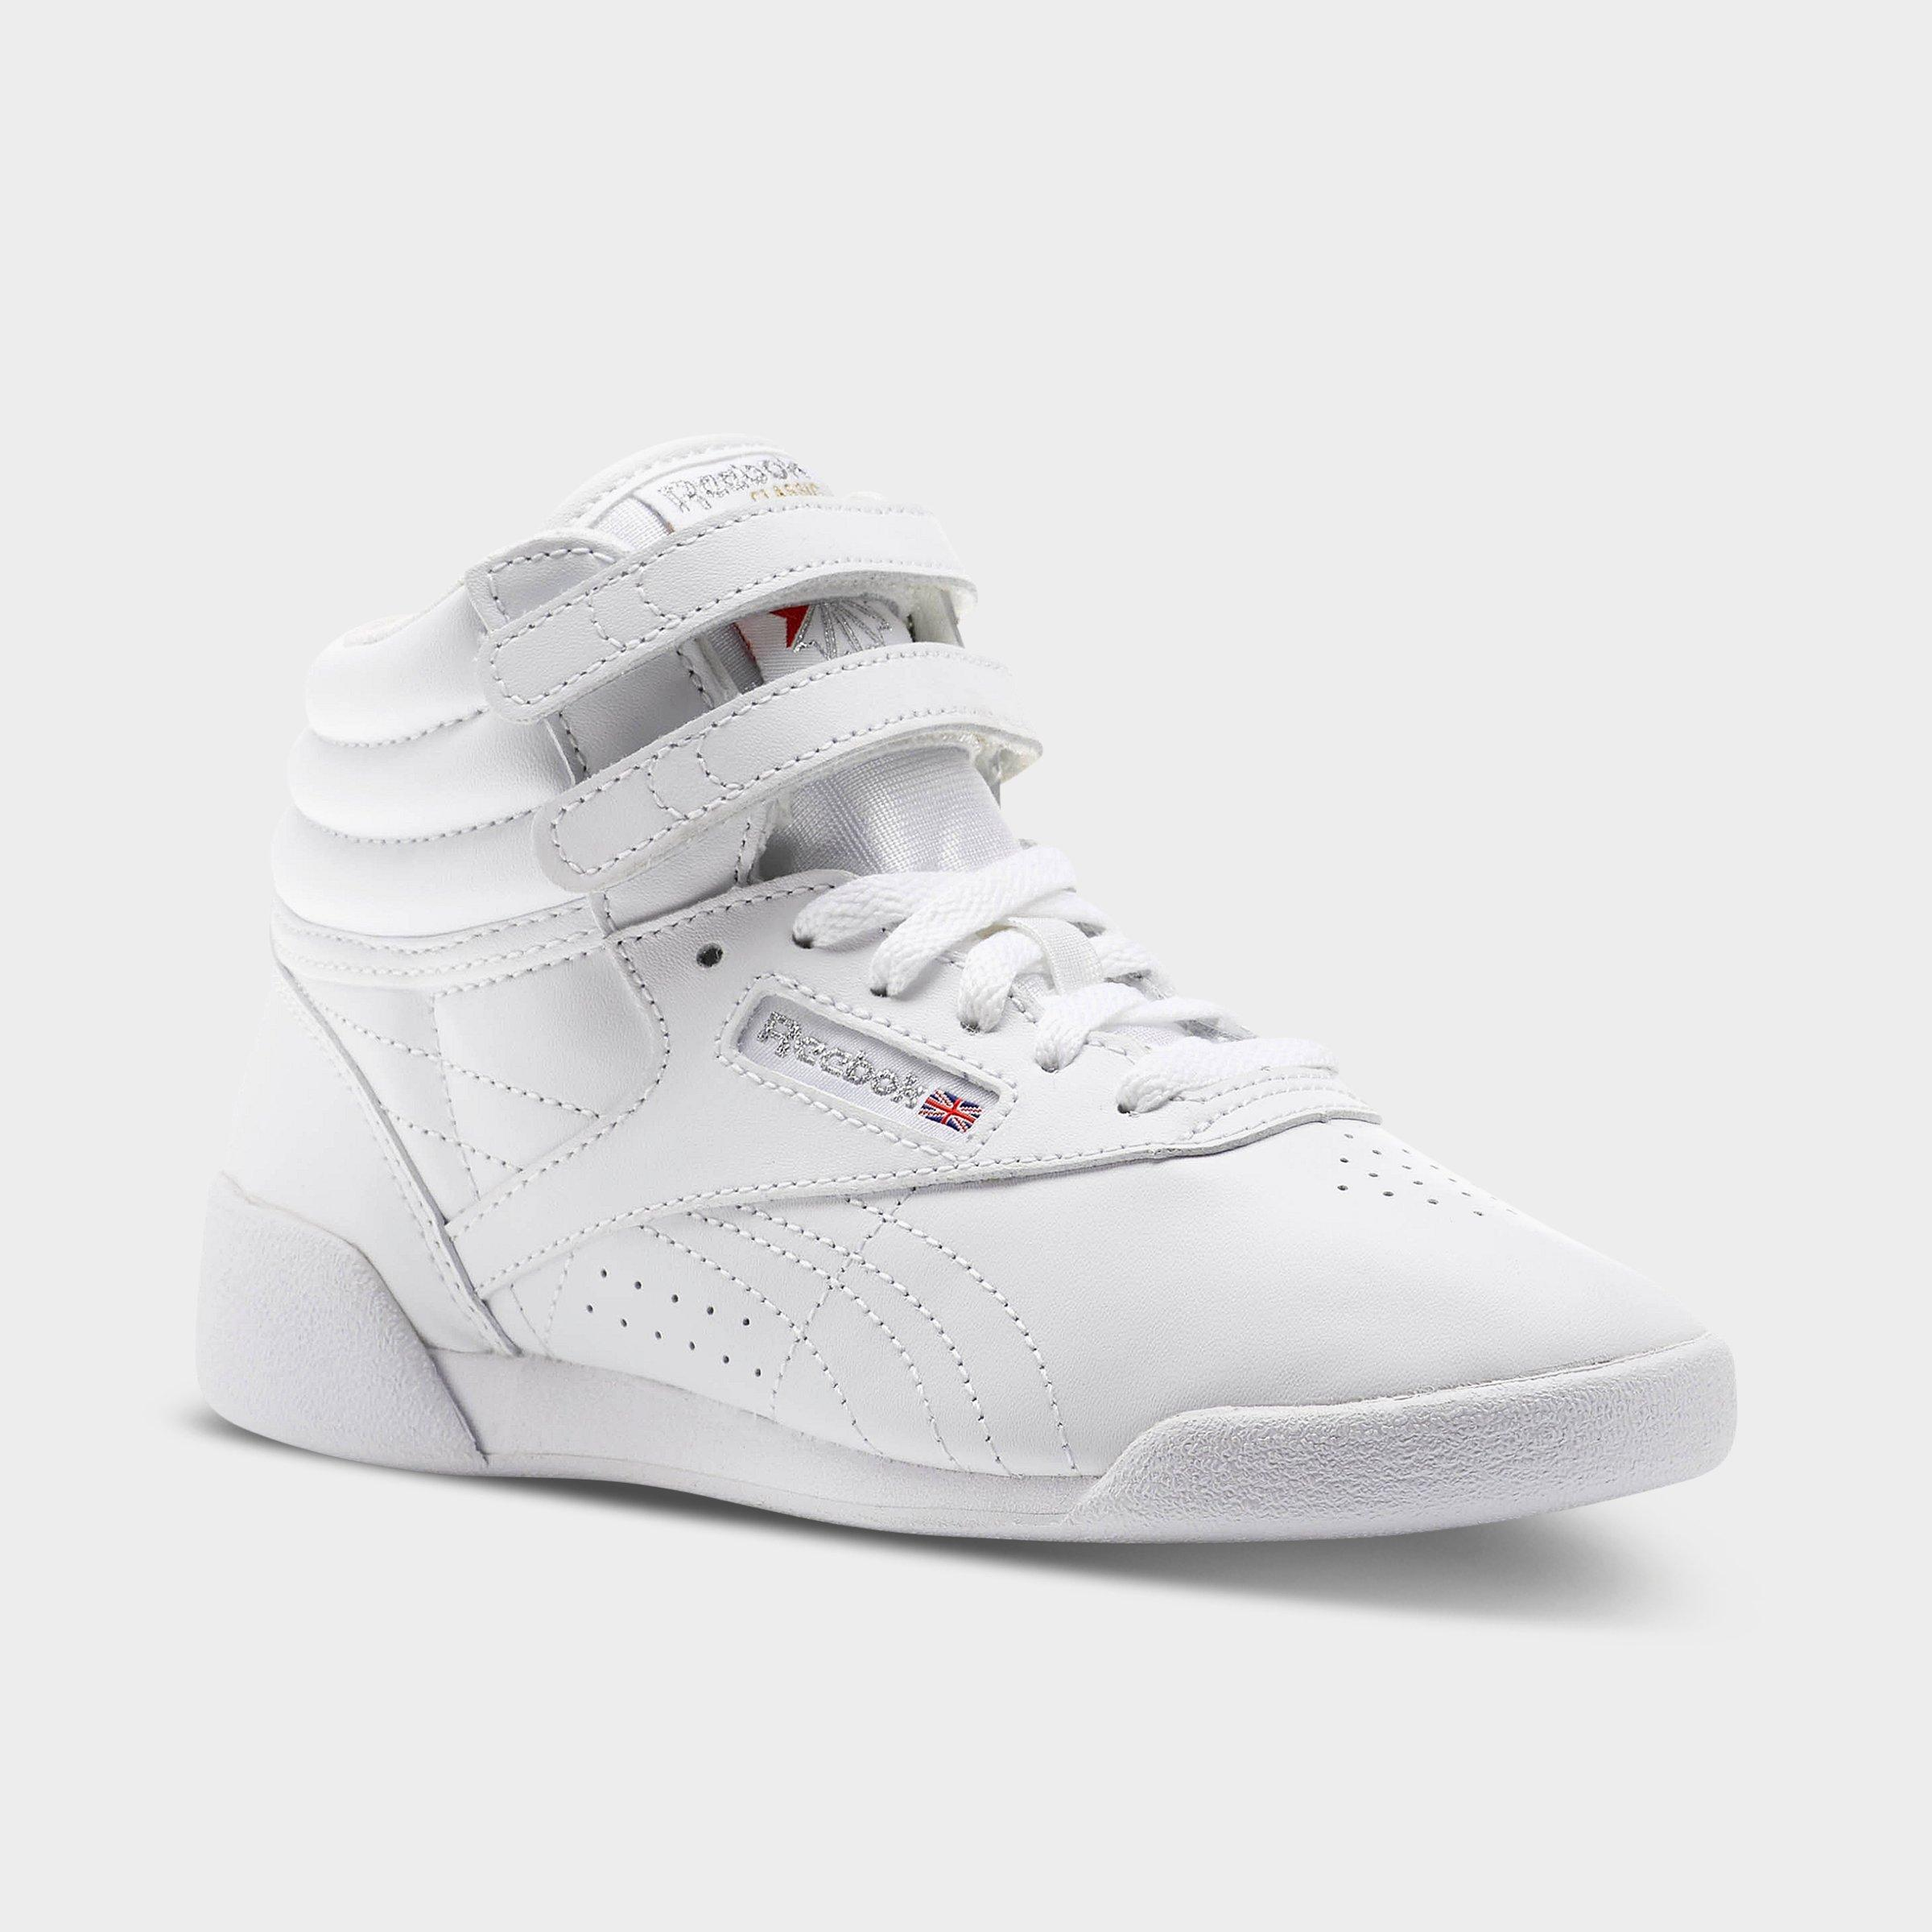 Nouveau Reebok Filles Chaussures De Loisirs Enfants Freestyle Hi Wool Grade School Sneakers